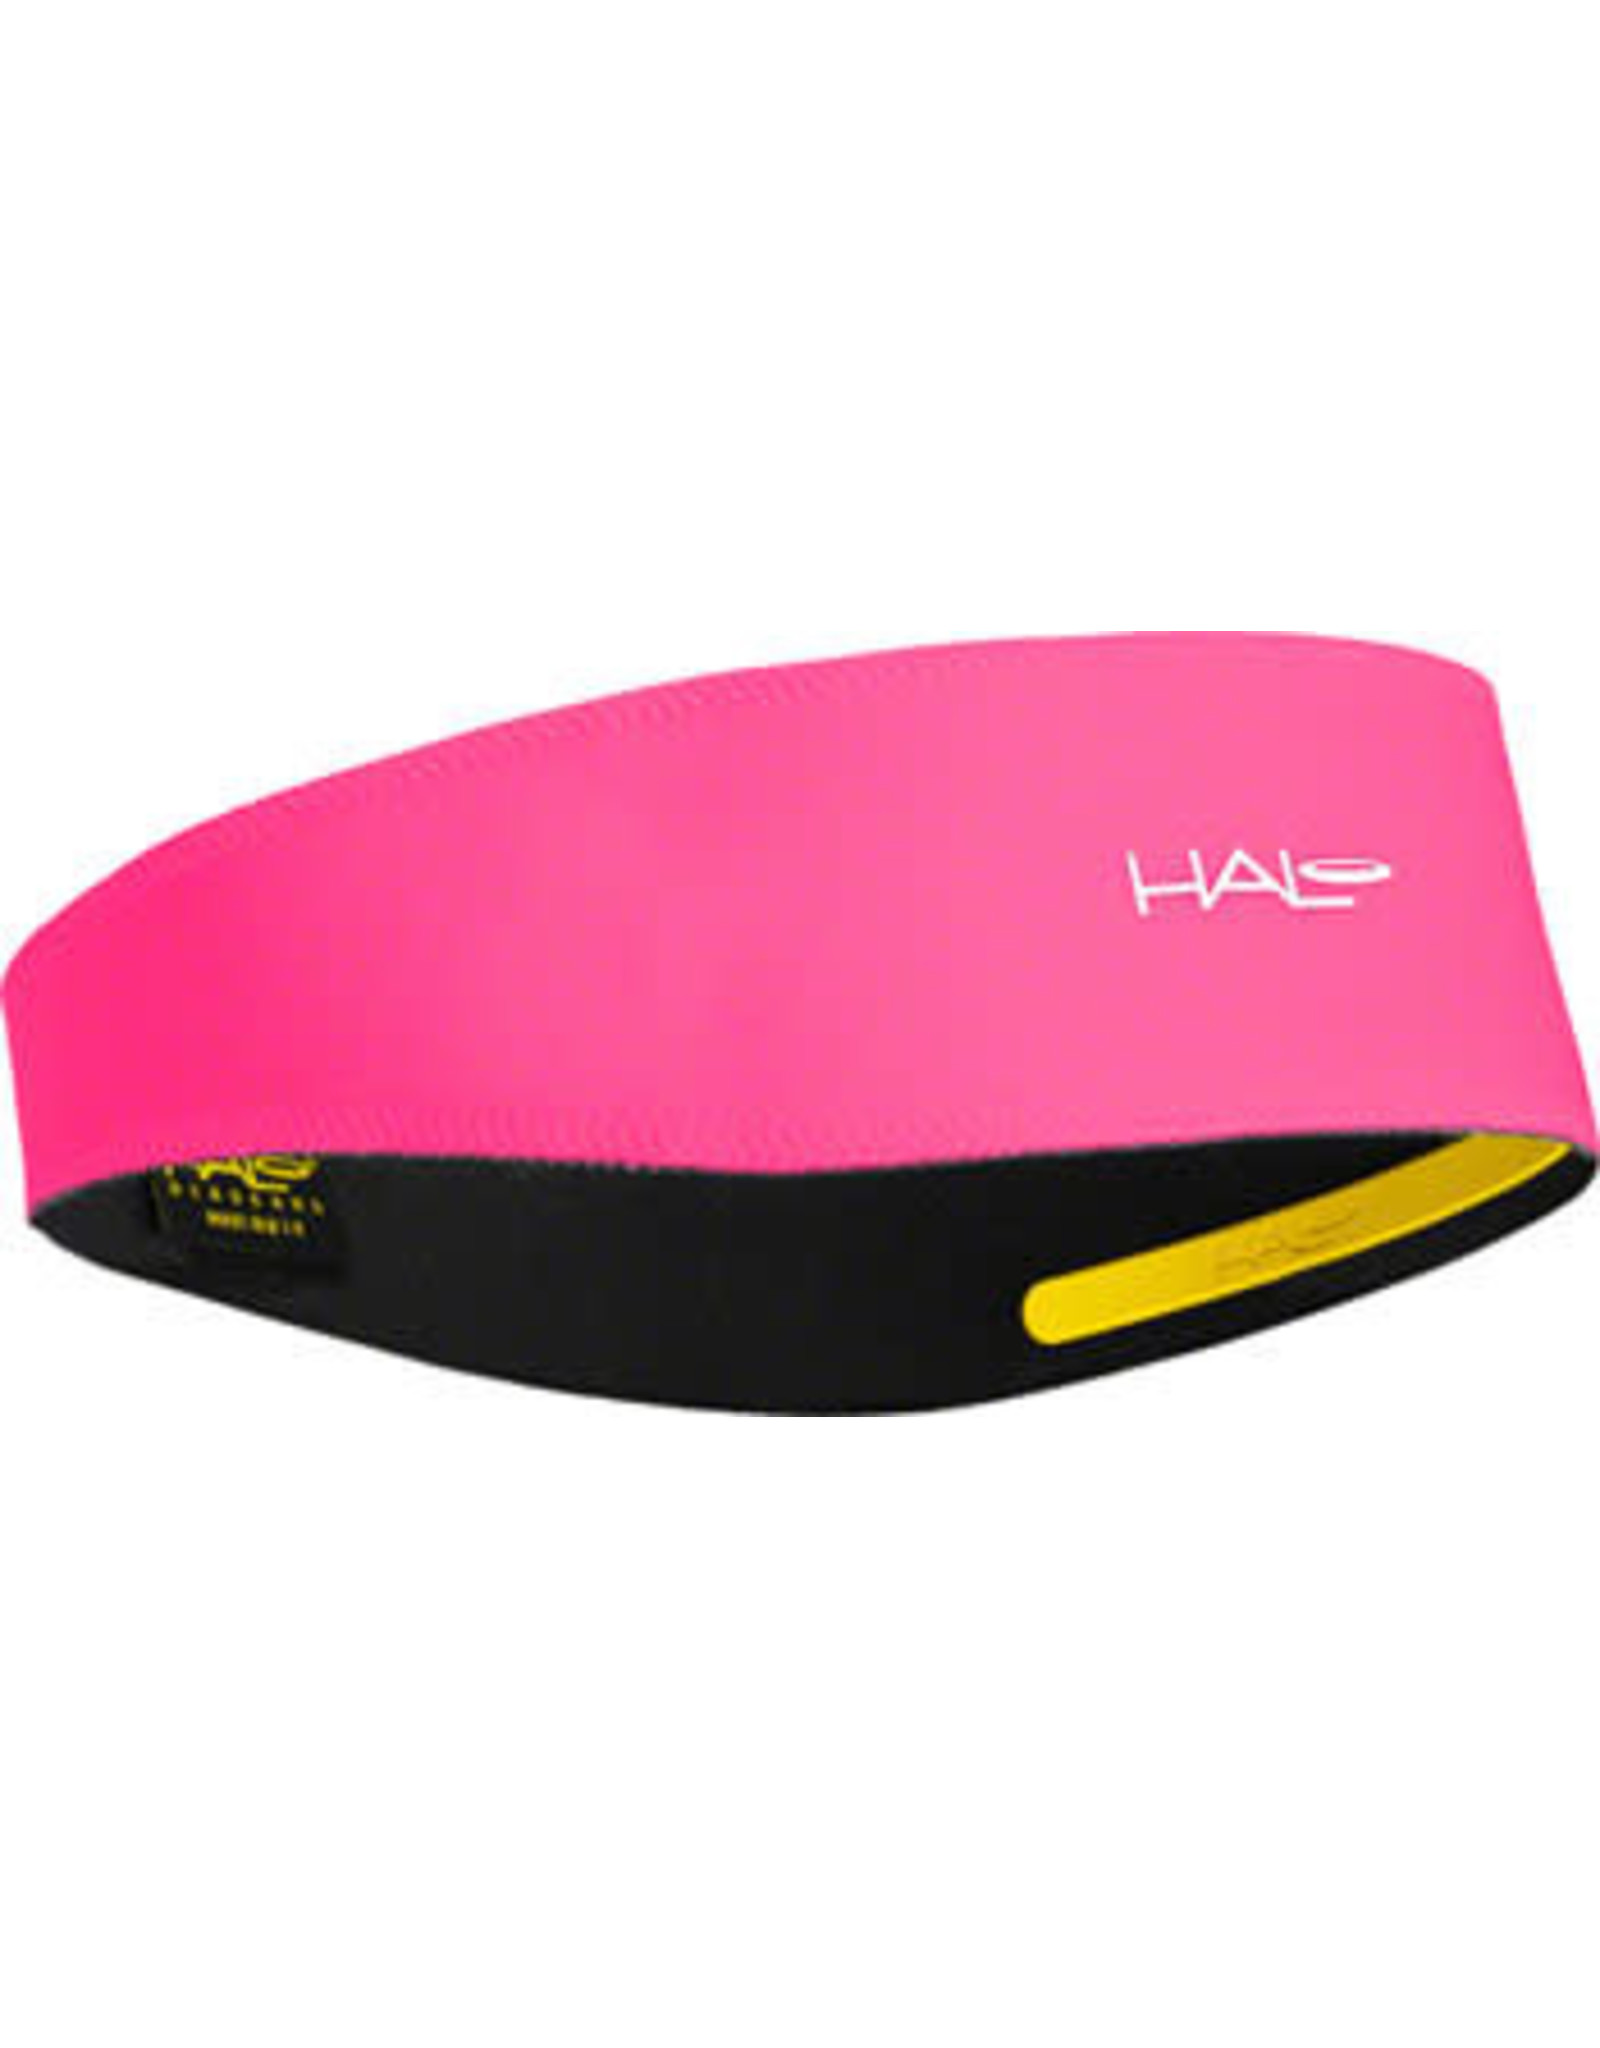 Halo Halo II Pullover Headband: Bright Pink